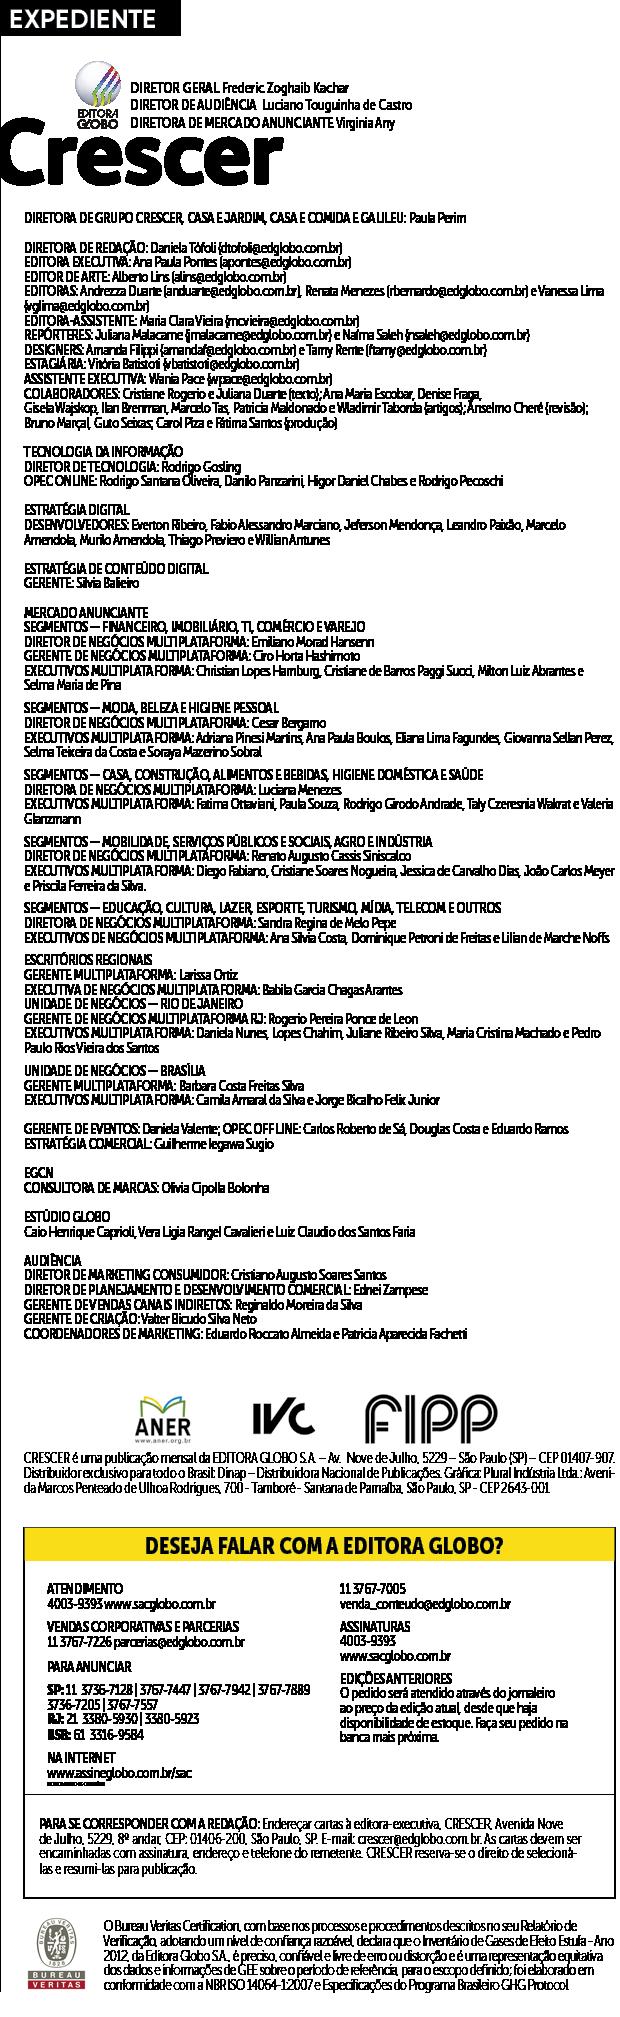 EXPEDIENTE CF280 (Foto: CRESCER)